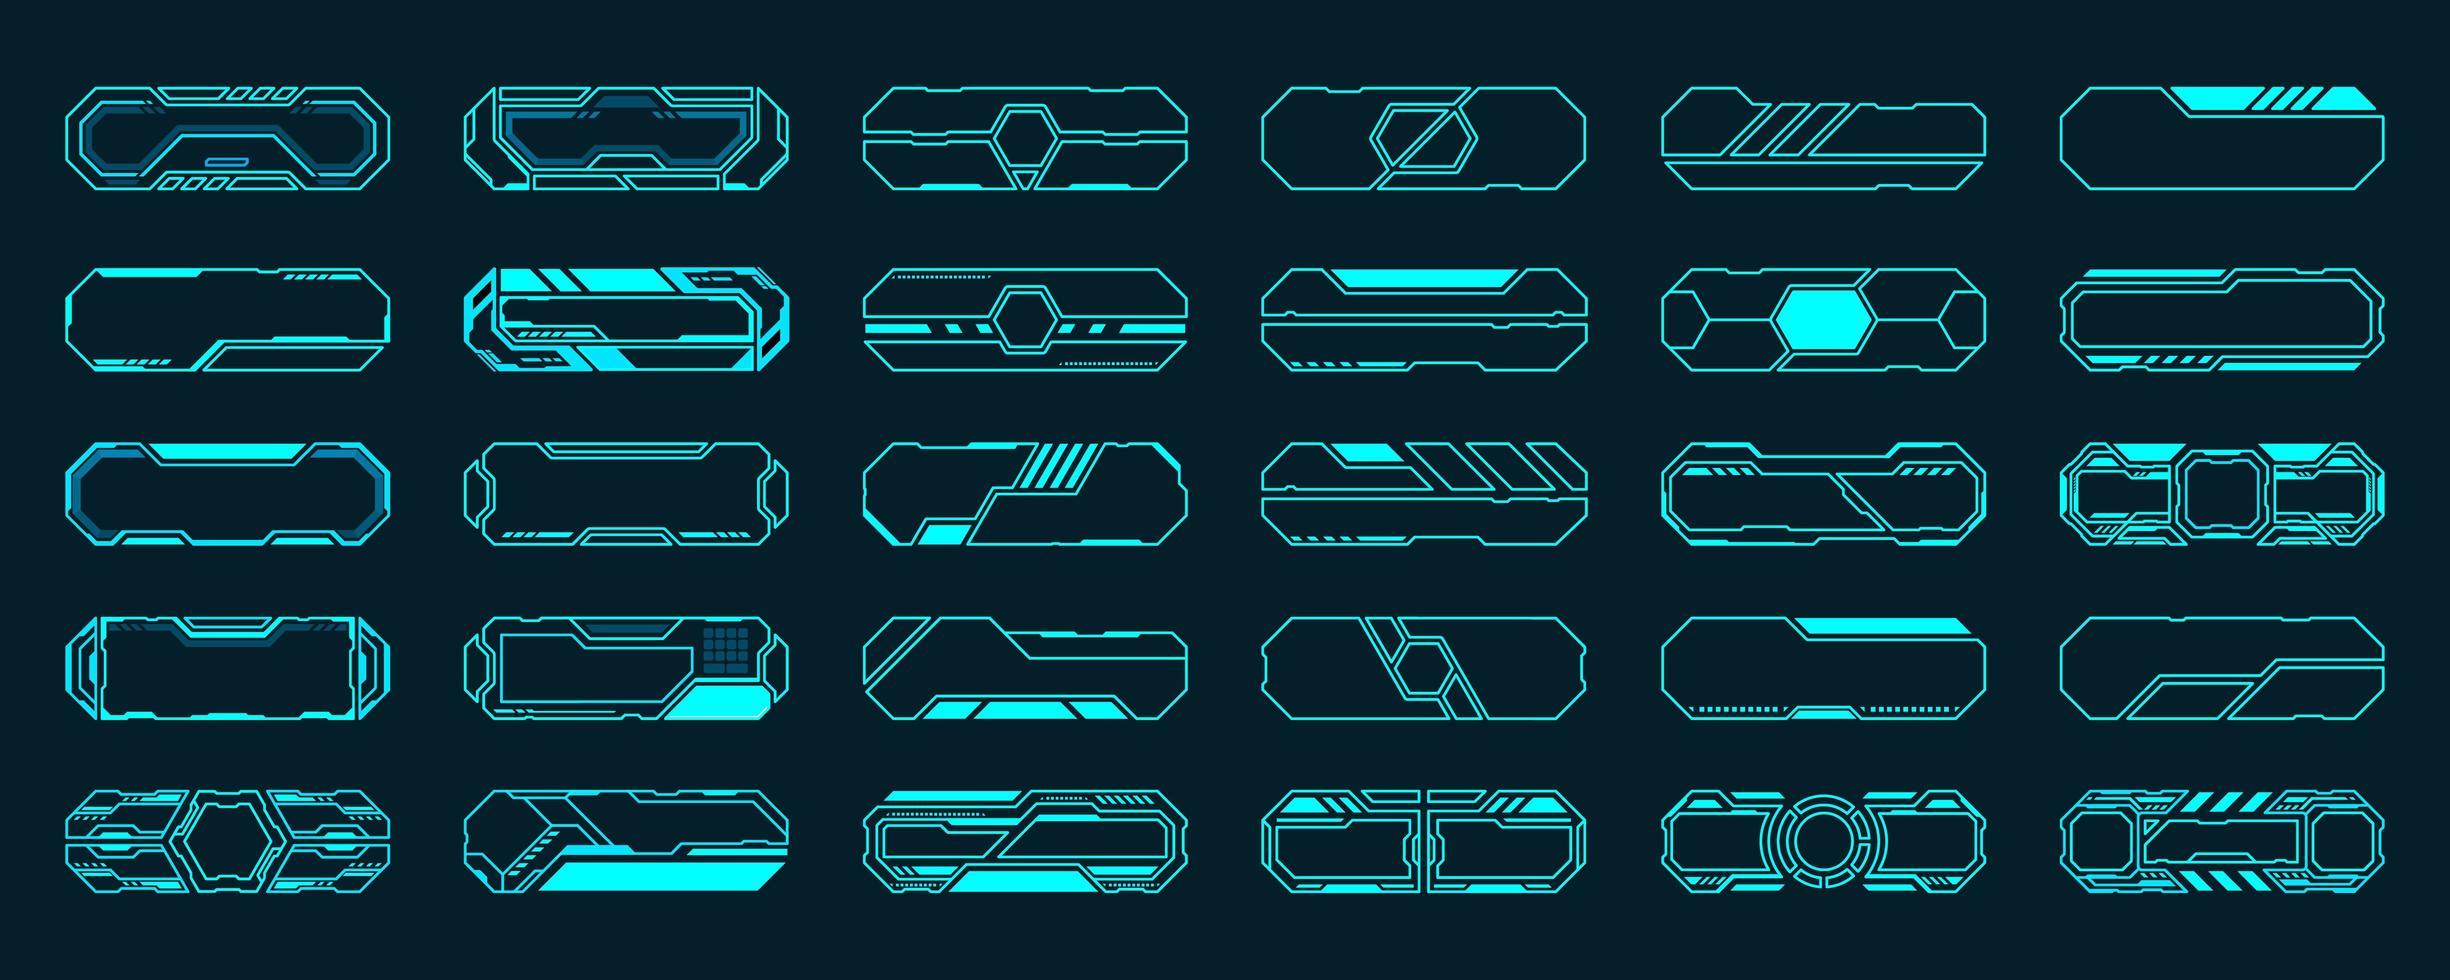 Conjunto de 30 quadros hud de interface futurista vetor